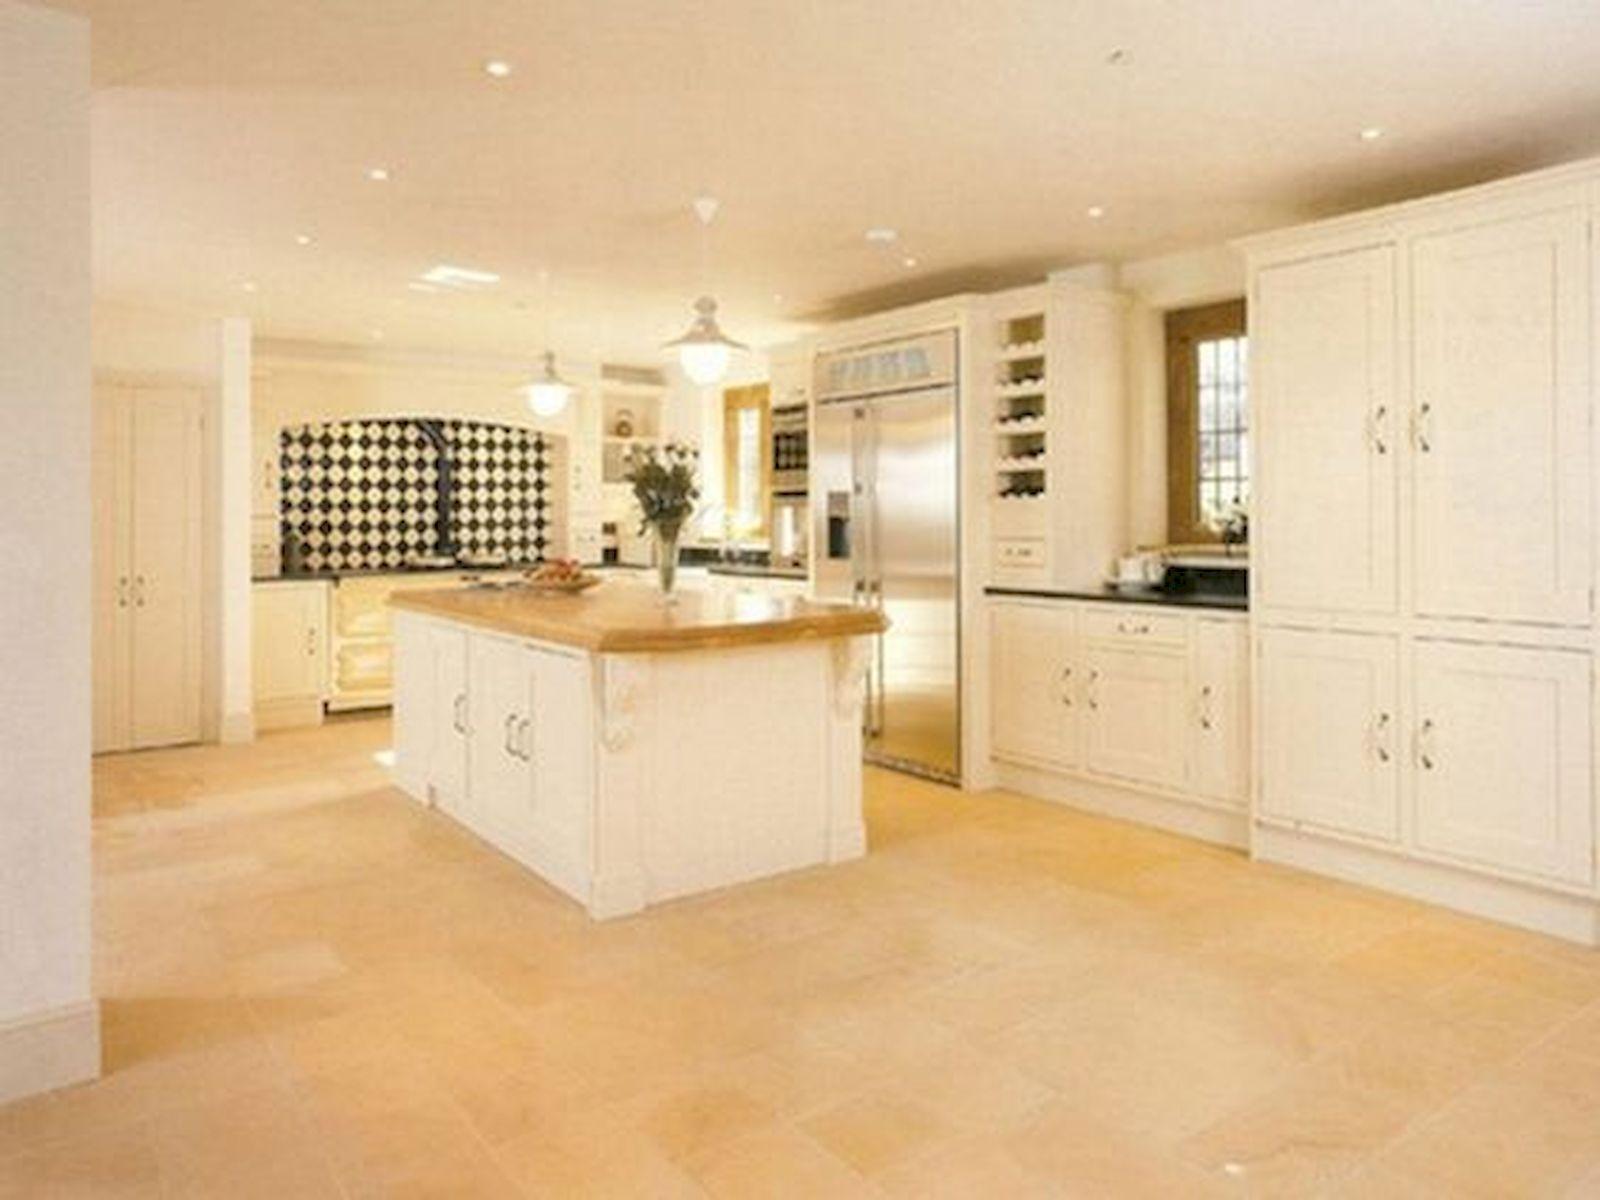 30 Best Kitchen Floor Tile Design Ideas With Concrete Floor Ideas (29)